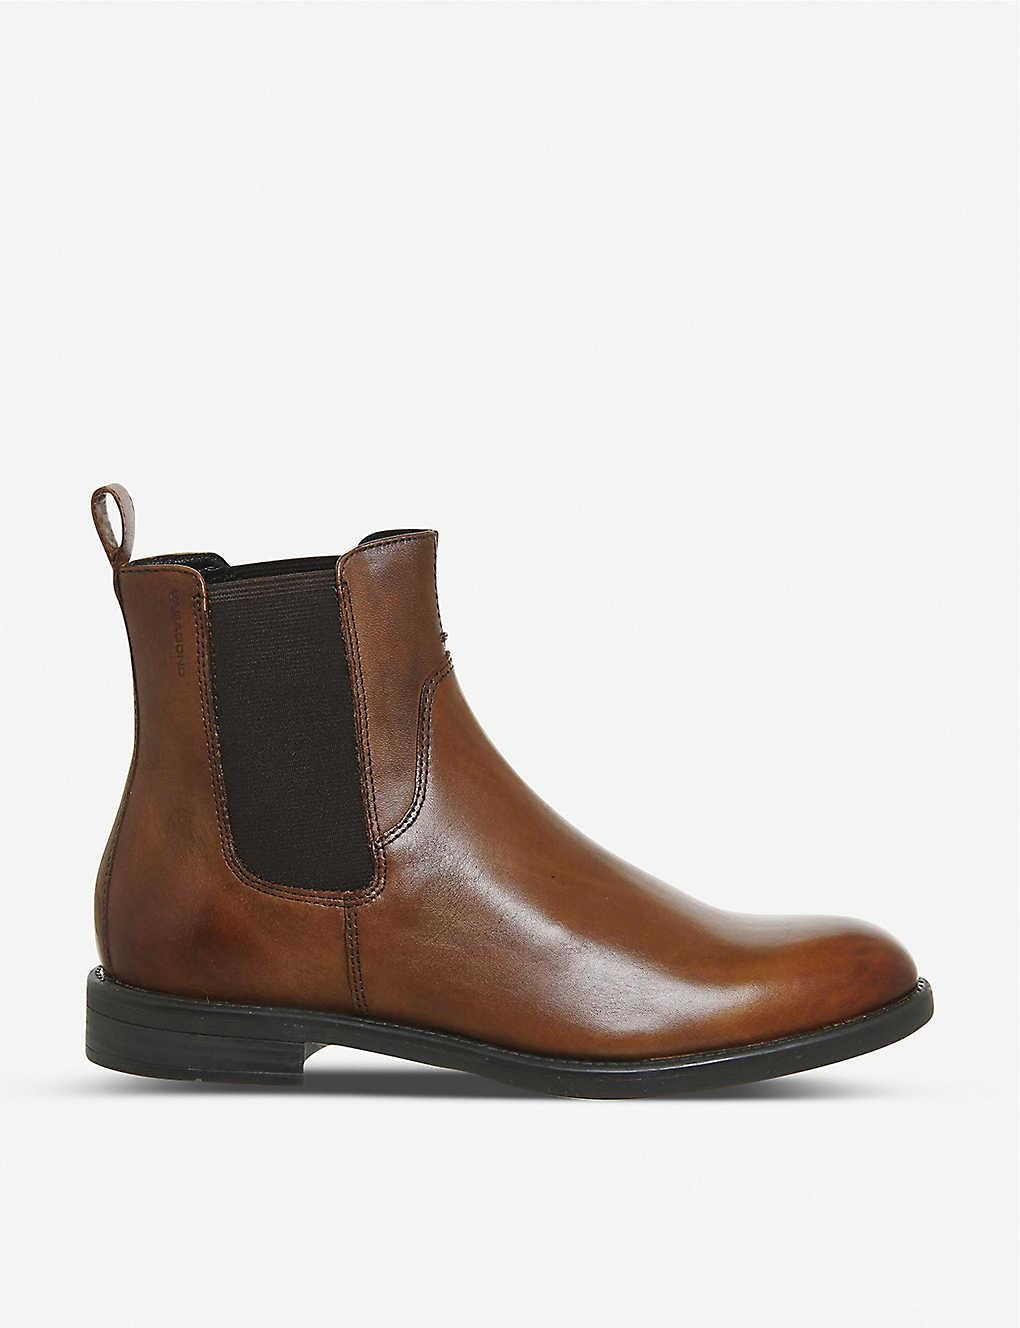 2121130cebd69f VAGABOND - Amina Chelsea leather boots